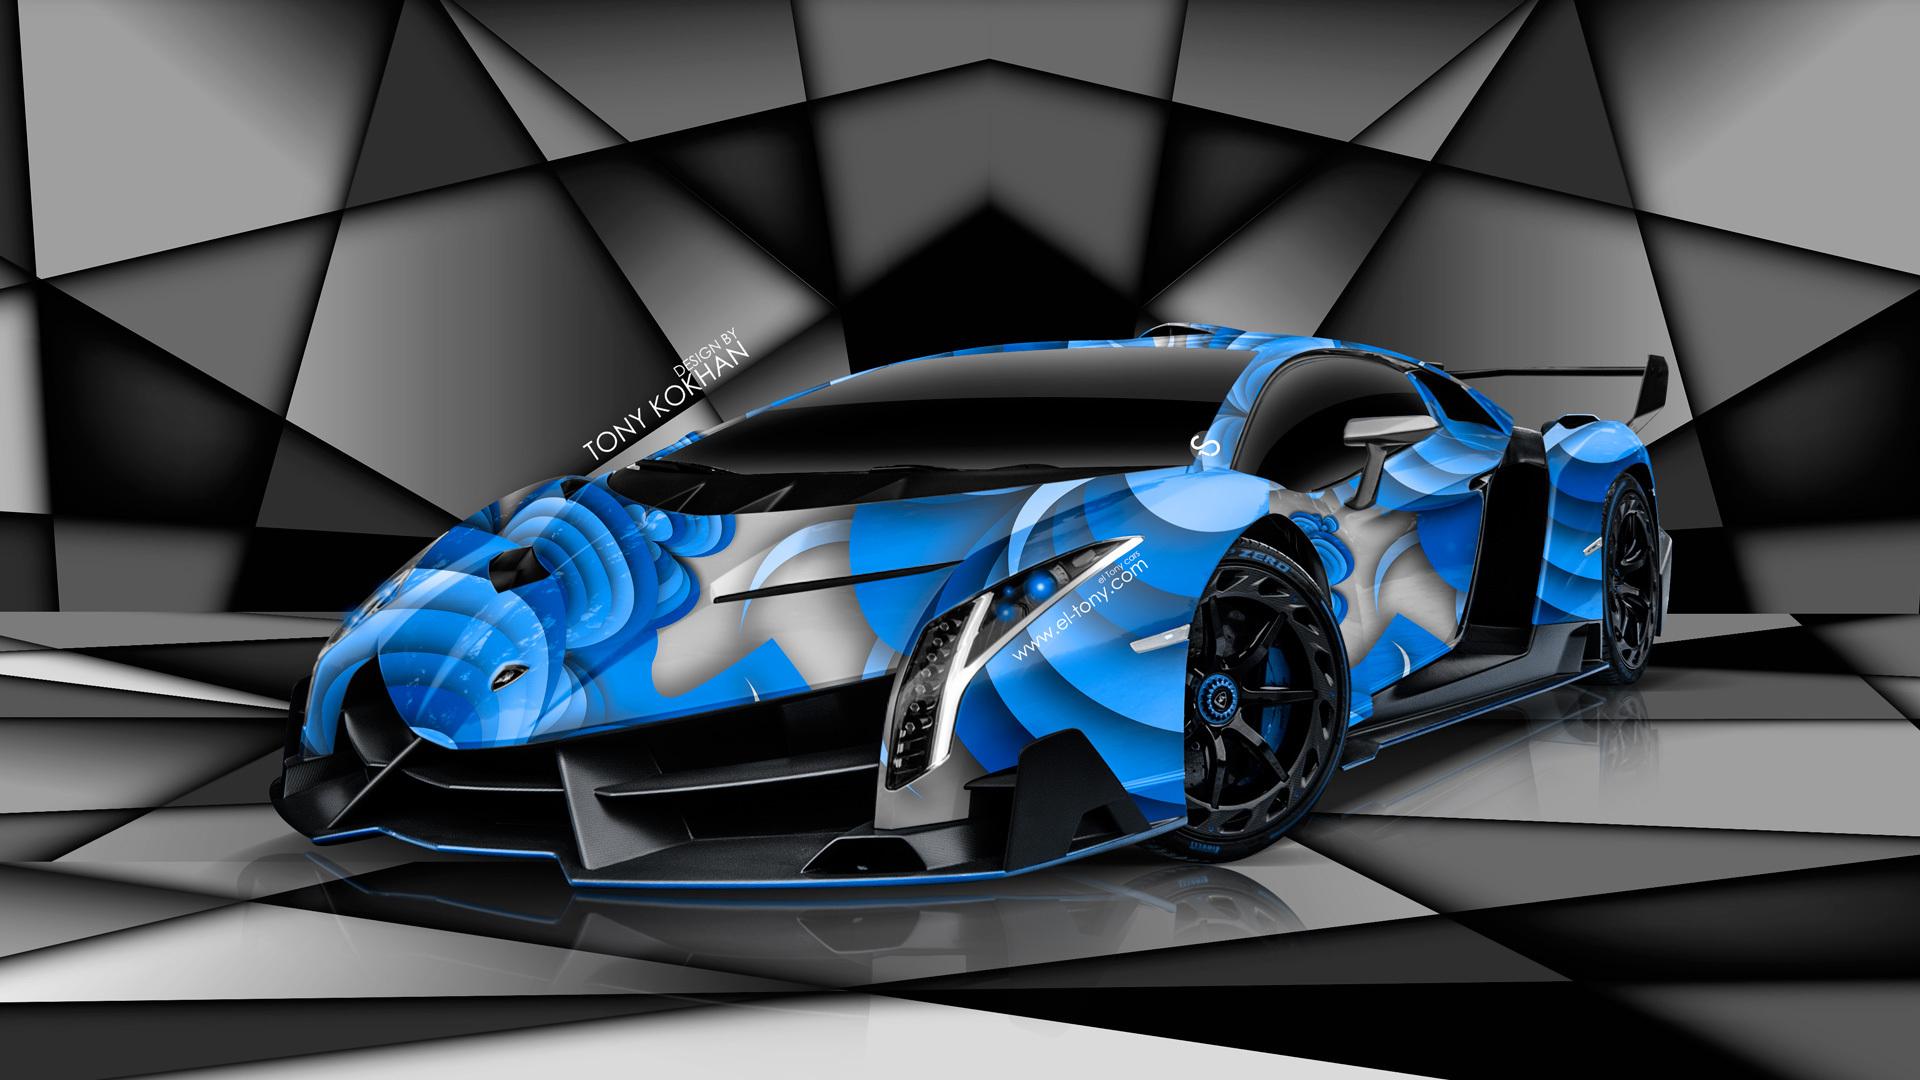 Lamborghini Veneno High Definition Wallpapers